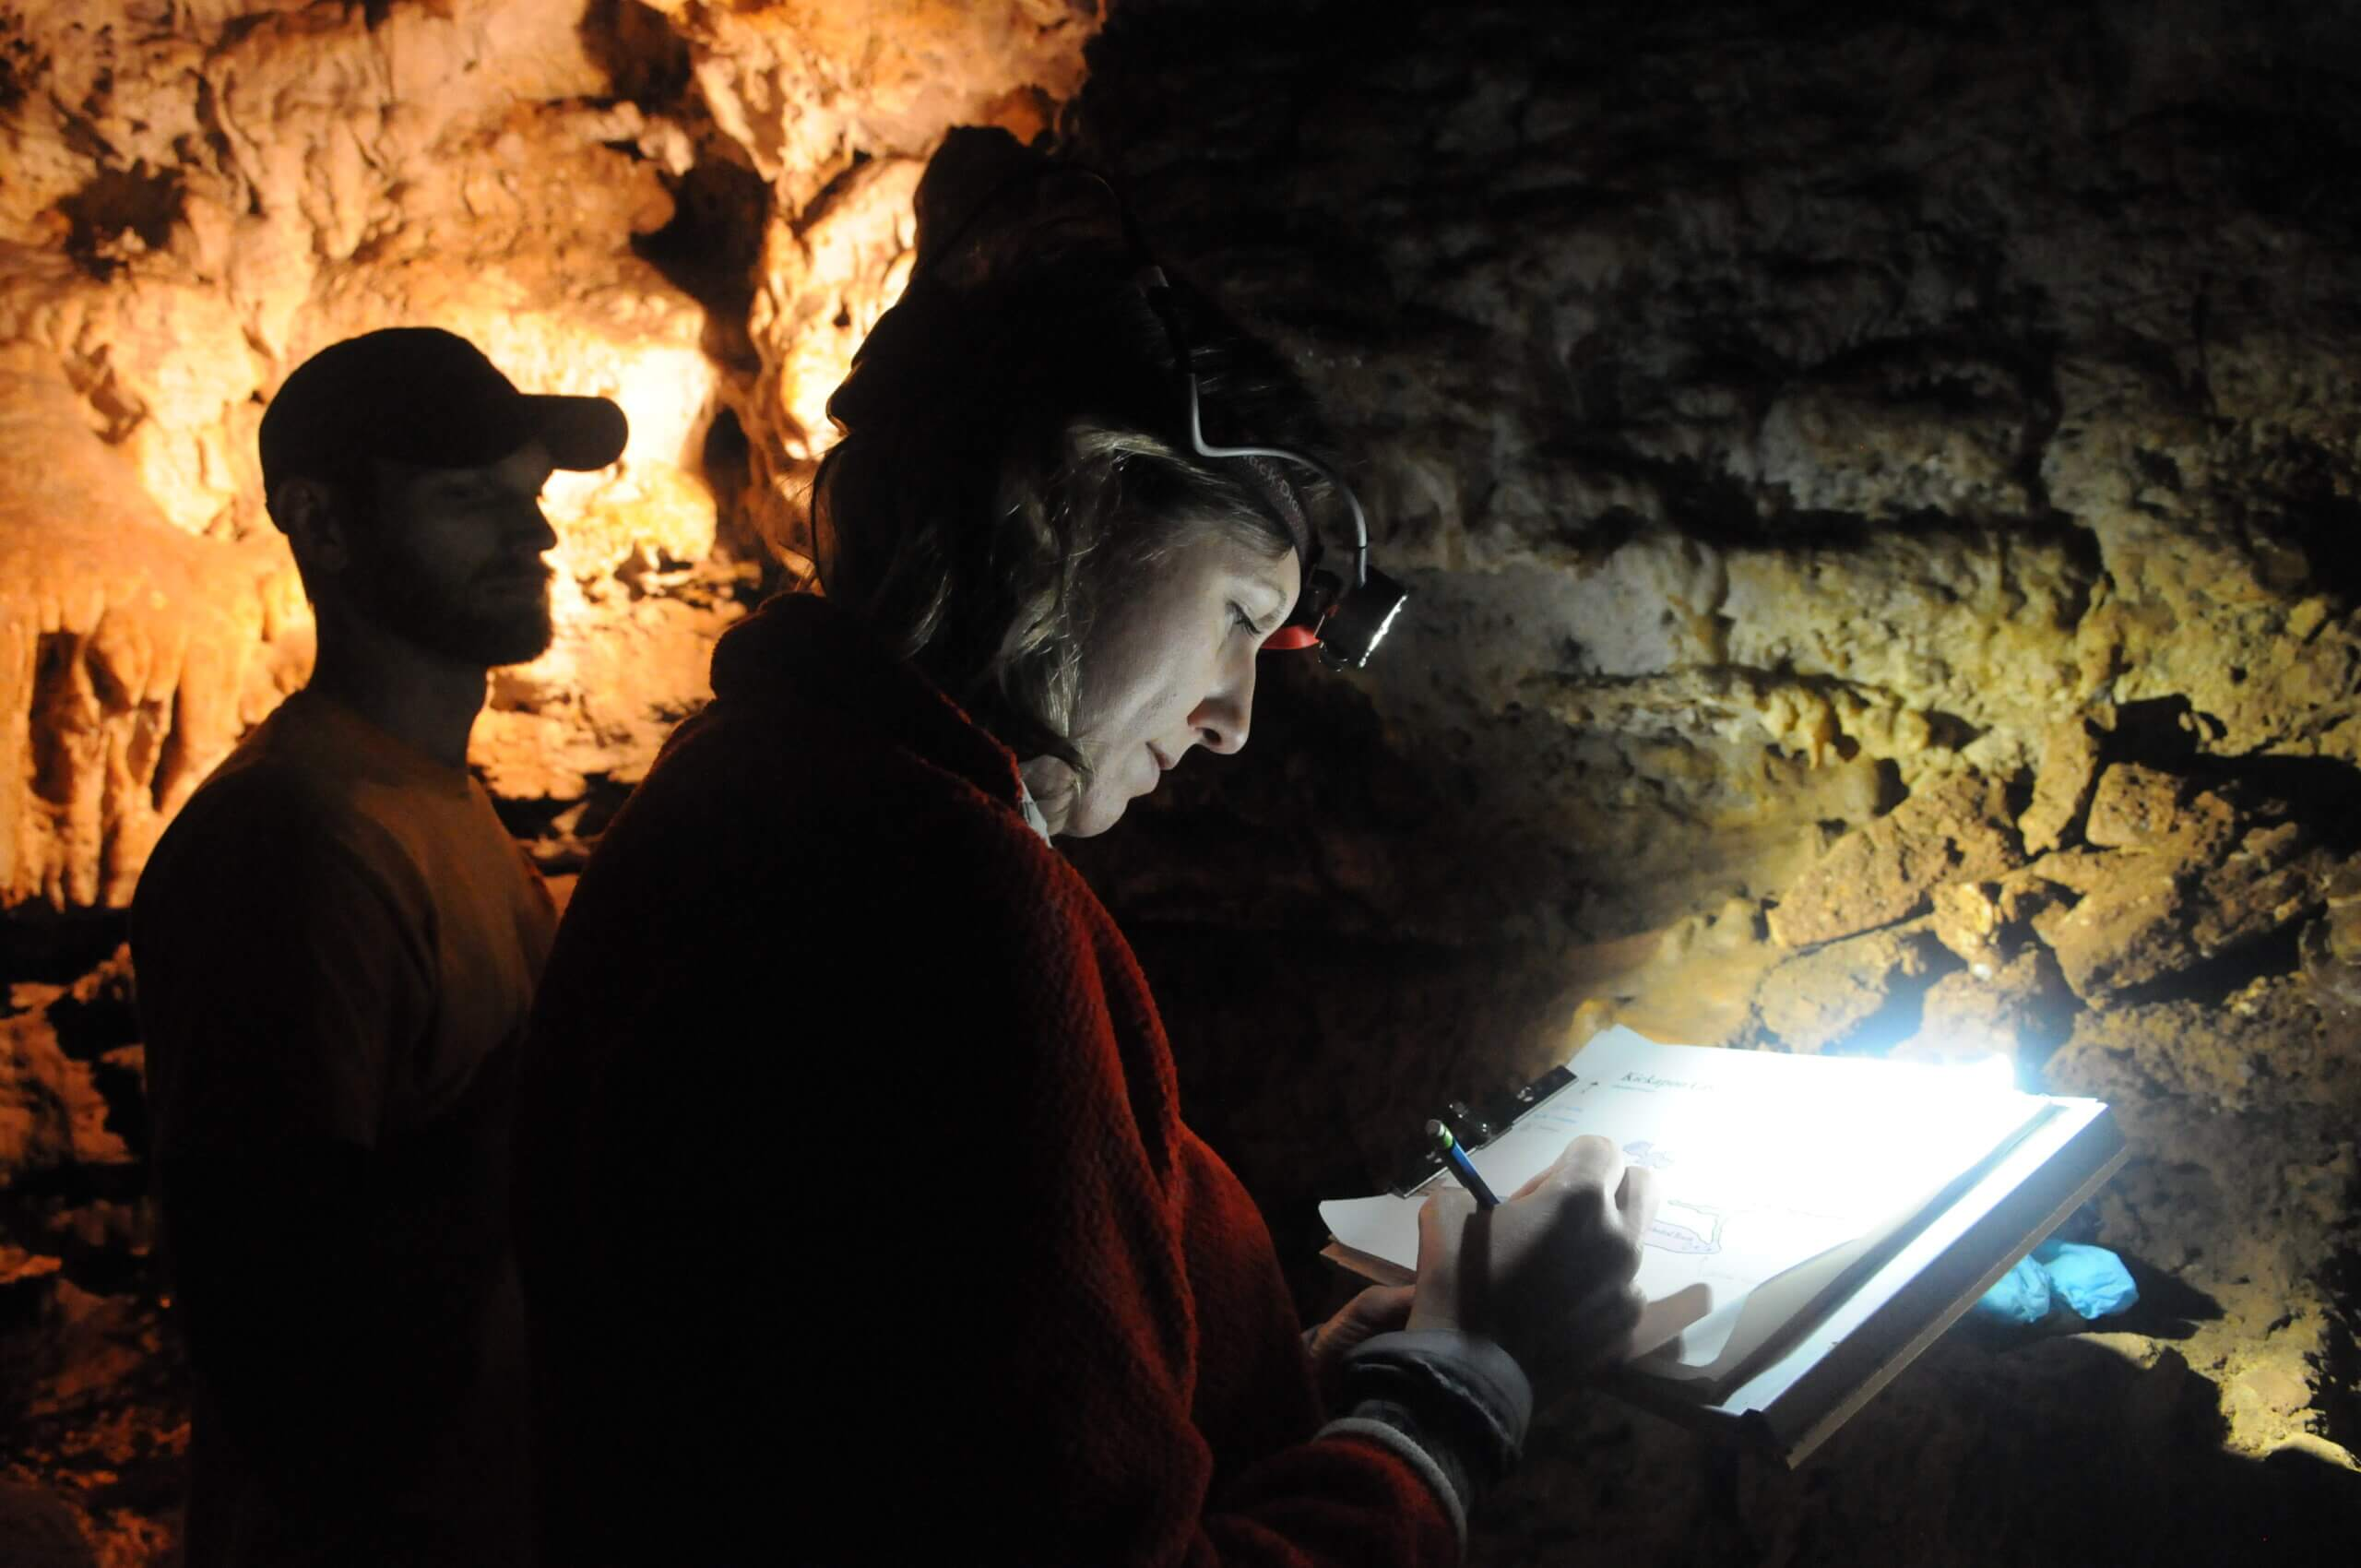 Two people explore the Kickapoo Caverns